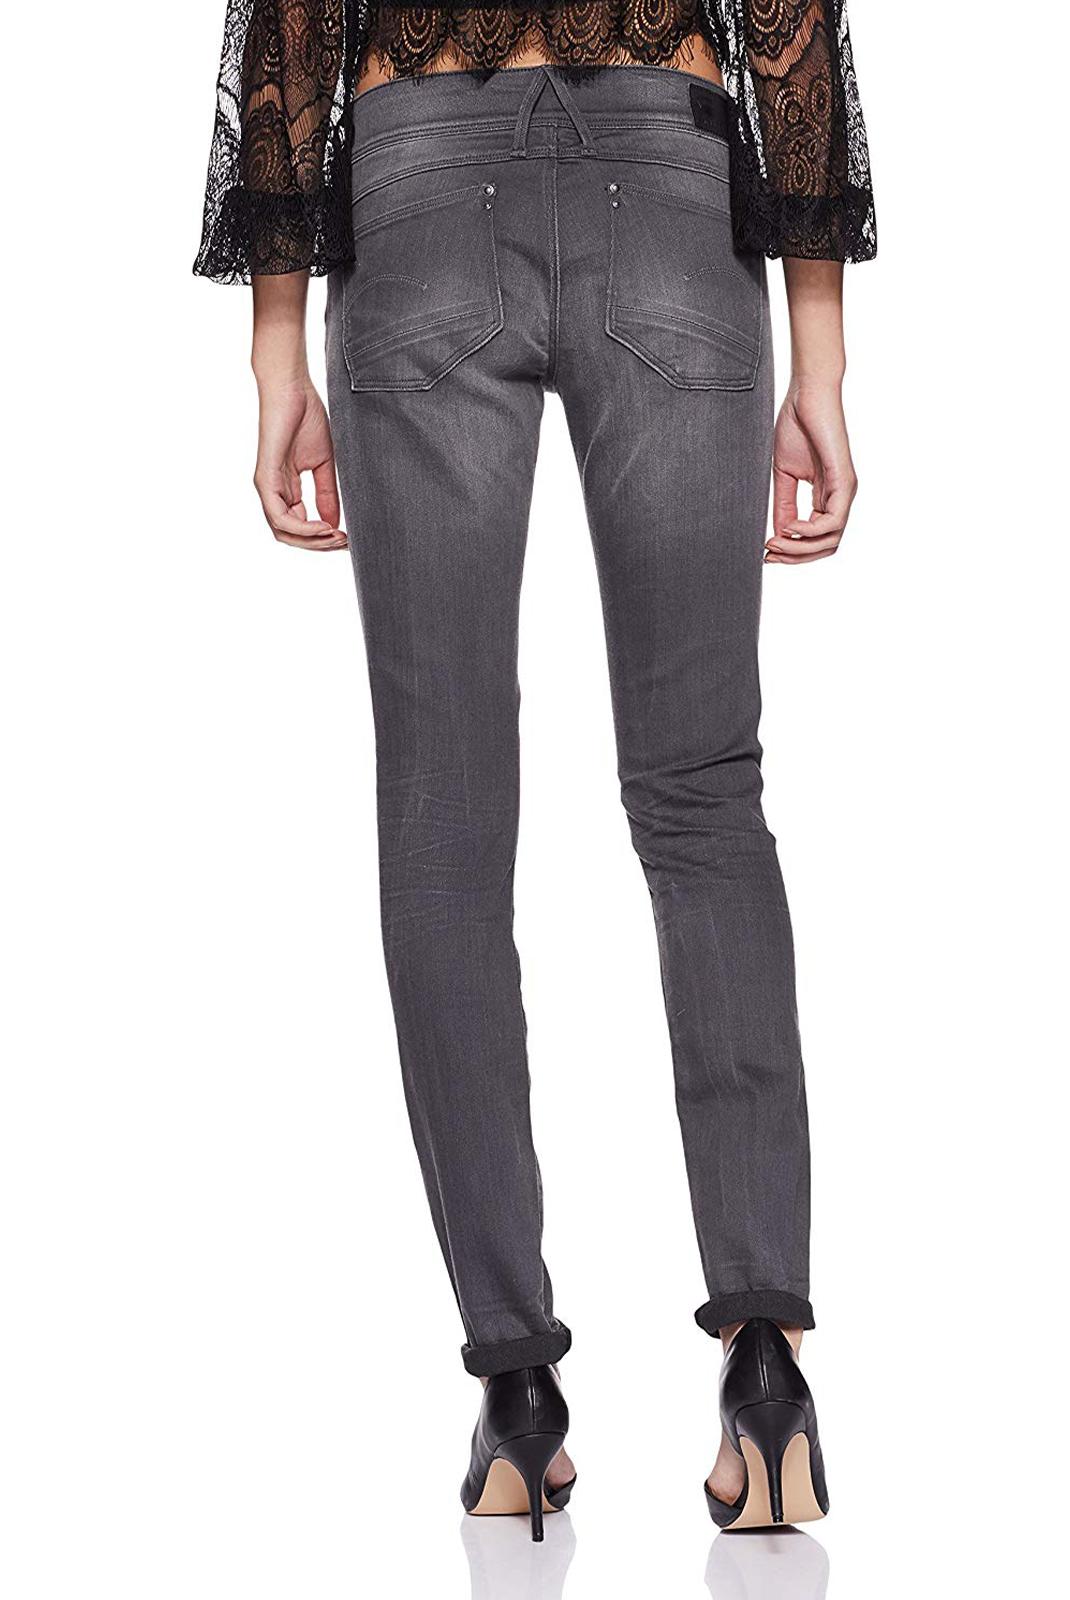 Jeans   G-star 60887.6132.071 lynn gris